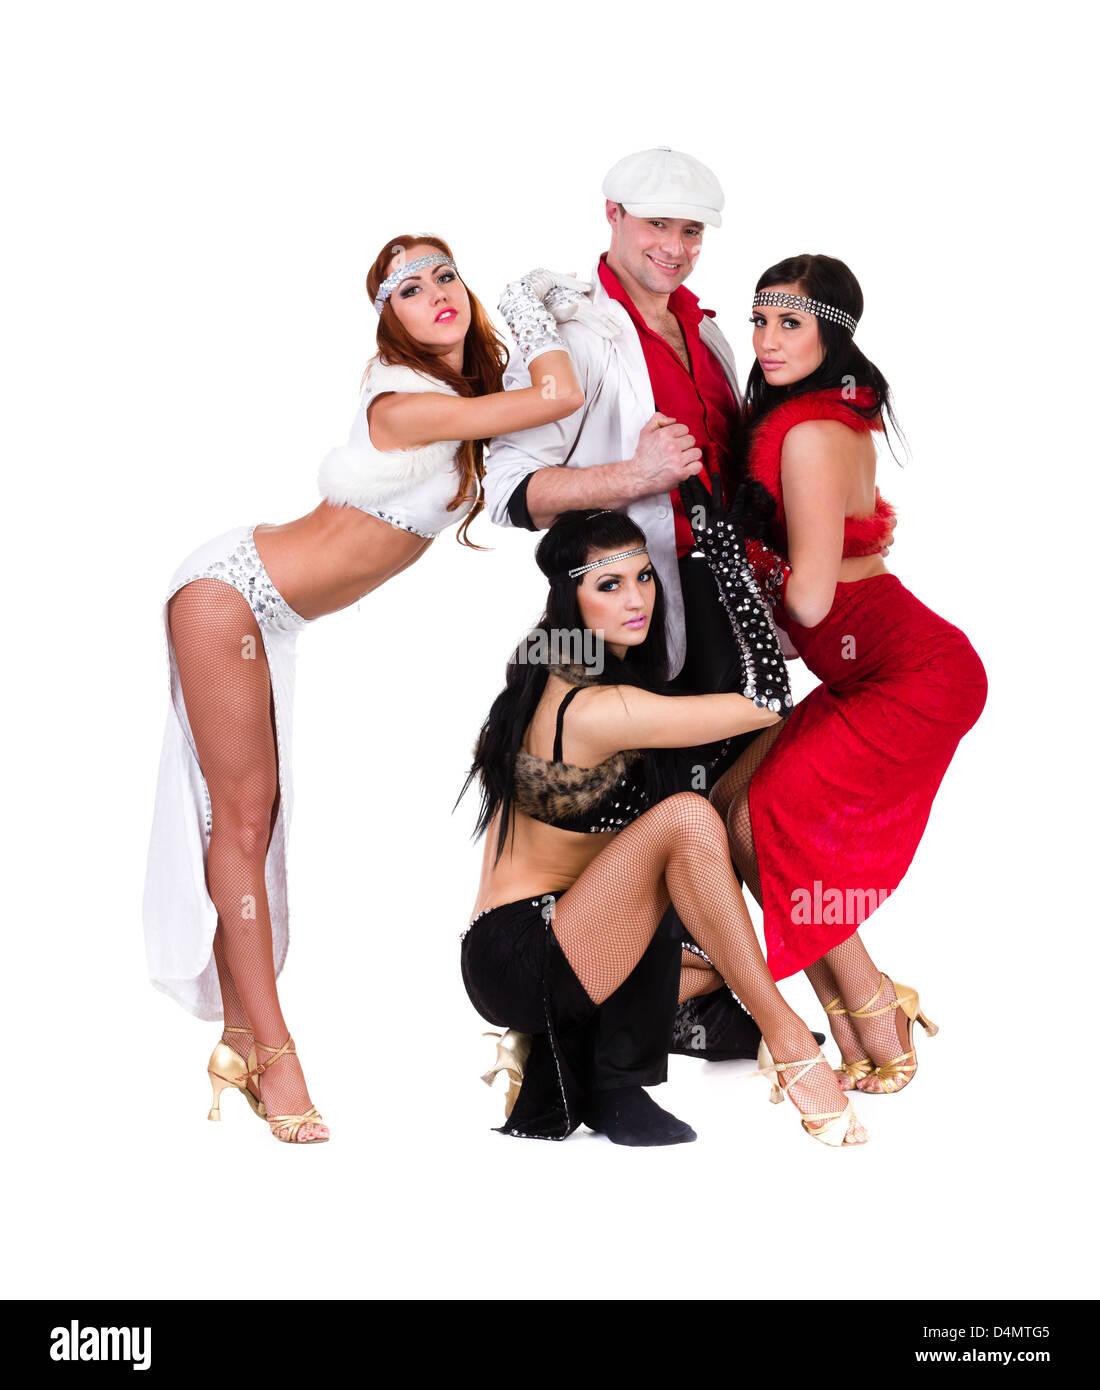 d3626a3a66d5 cabaret dancer team dressed in vintage costumes Stock Photo ...